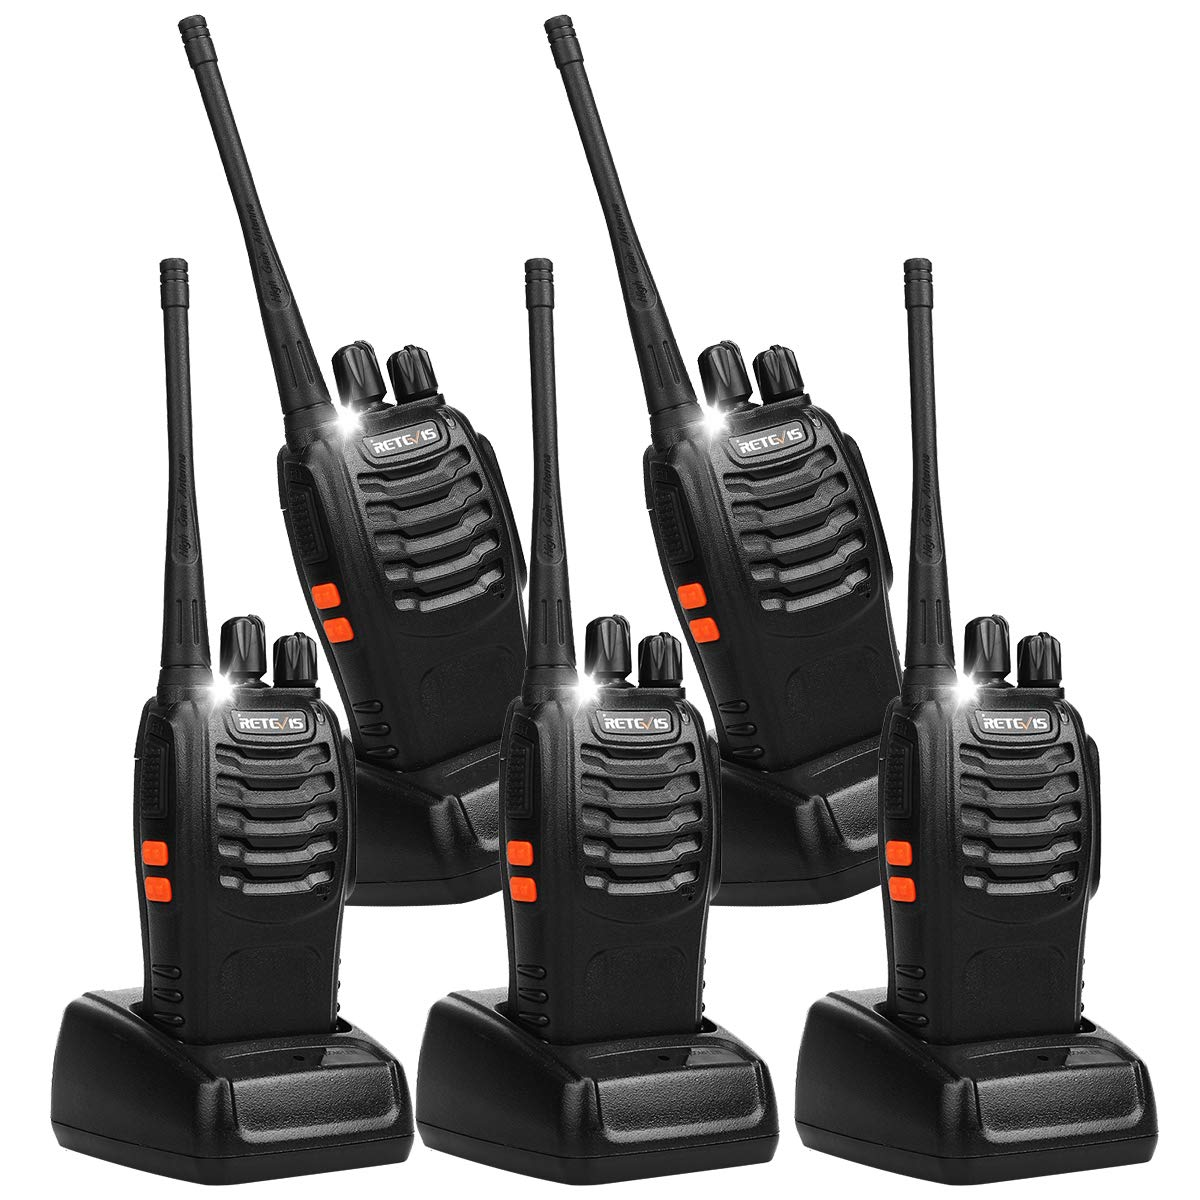 Retevis H-777 2 Way Radio Walkie Talkies UHF 16CH CTCSS/DCS Flashlight Walkie Talkies (5 Pack) by Retevis